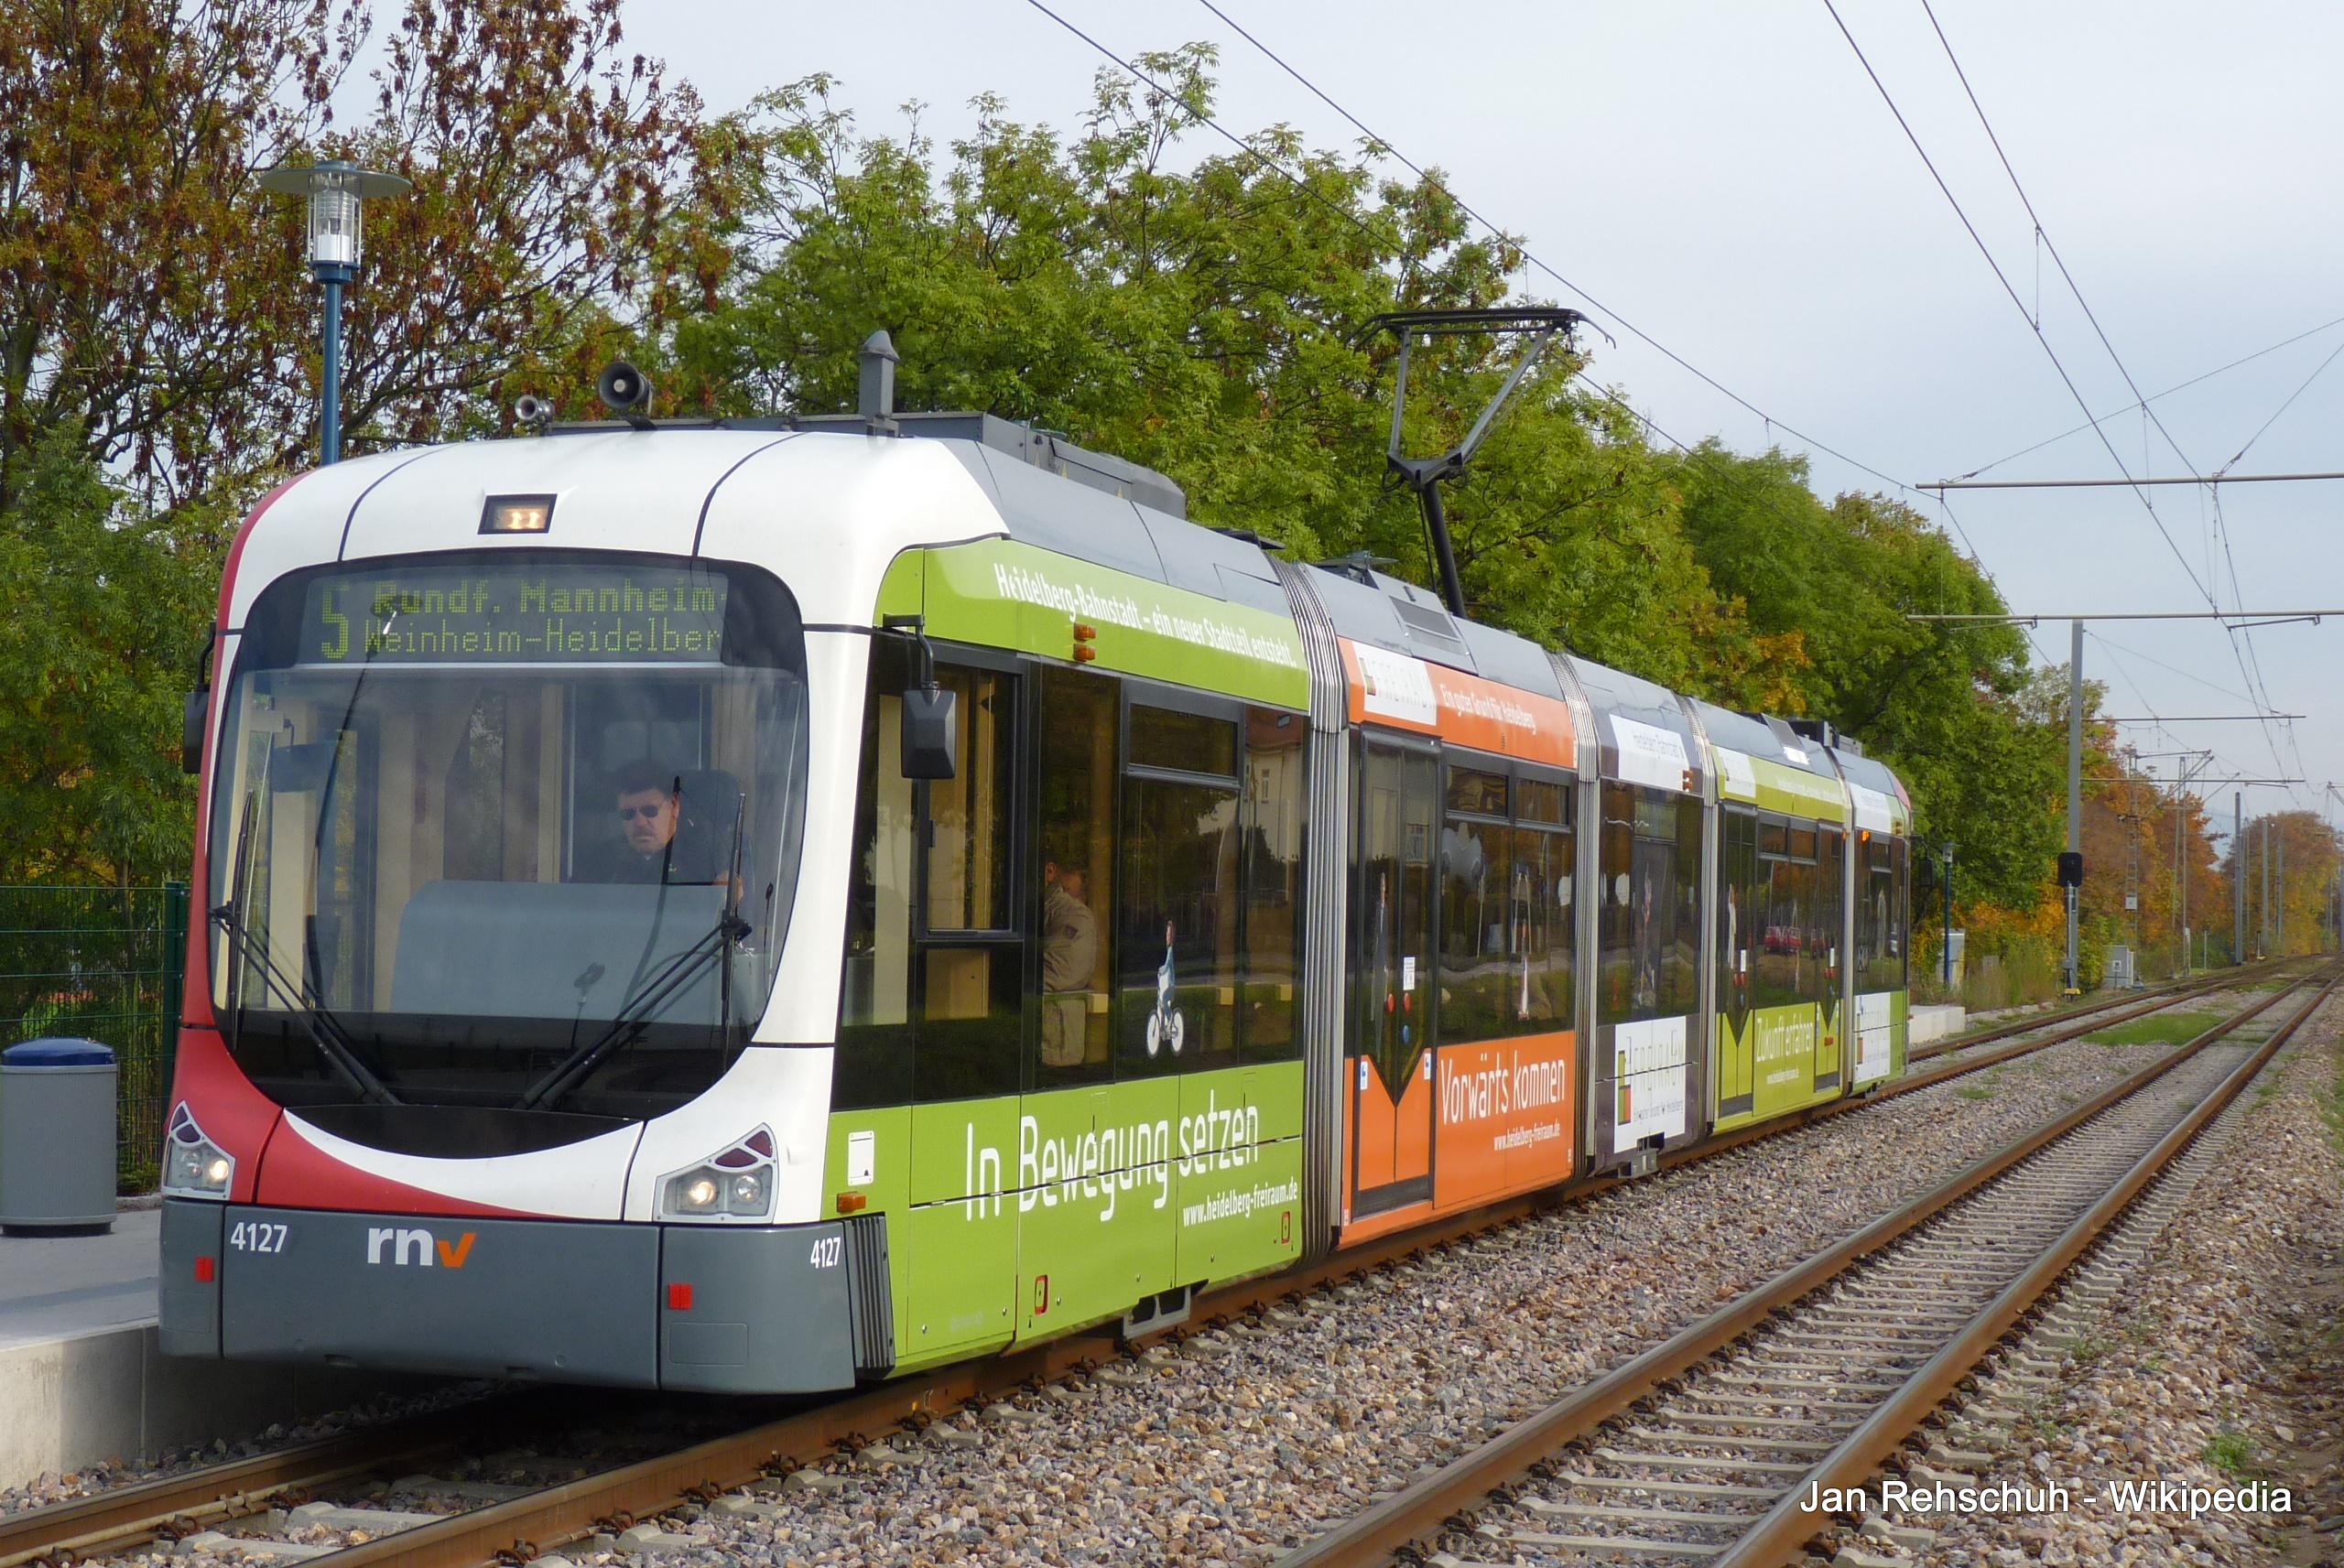 Streetcar Straßenbahn Tram Mannheim RNV Rhein-Neckar-Verbund 01.JPG